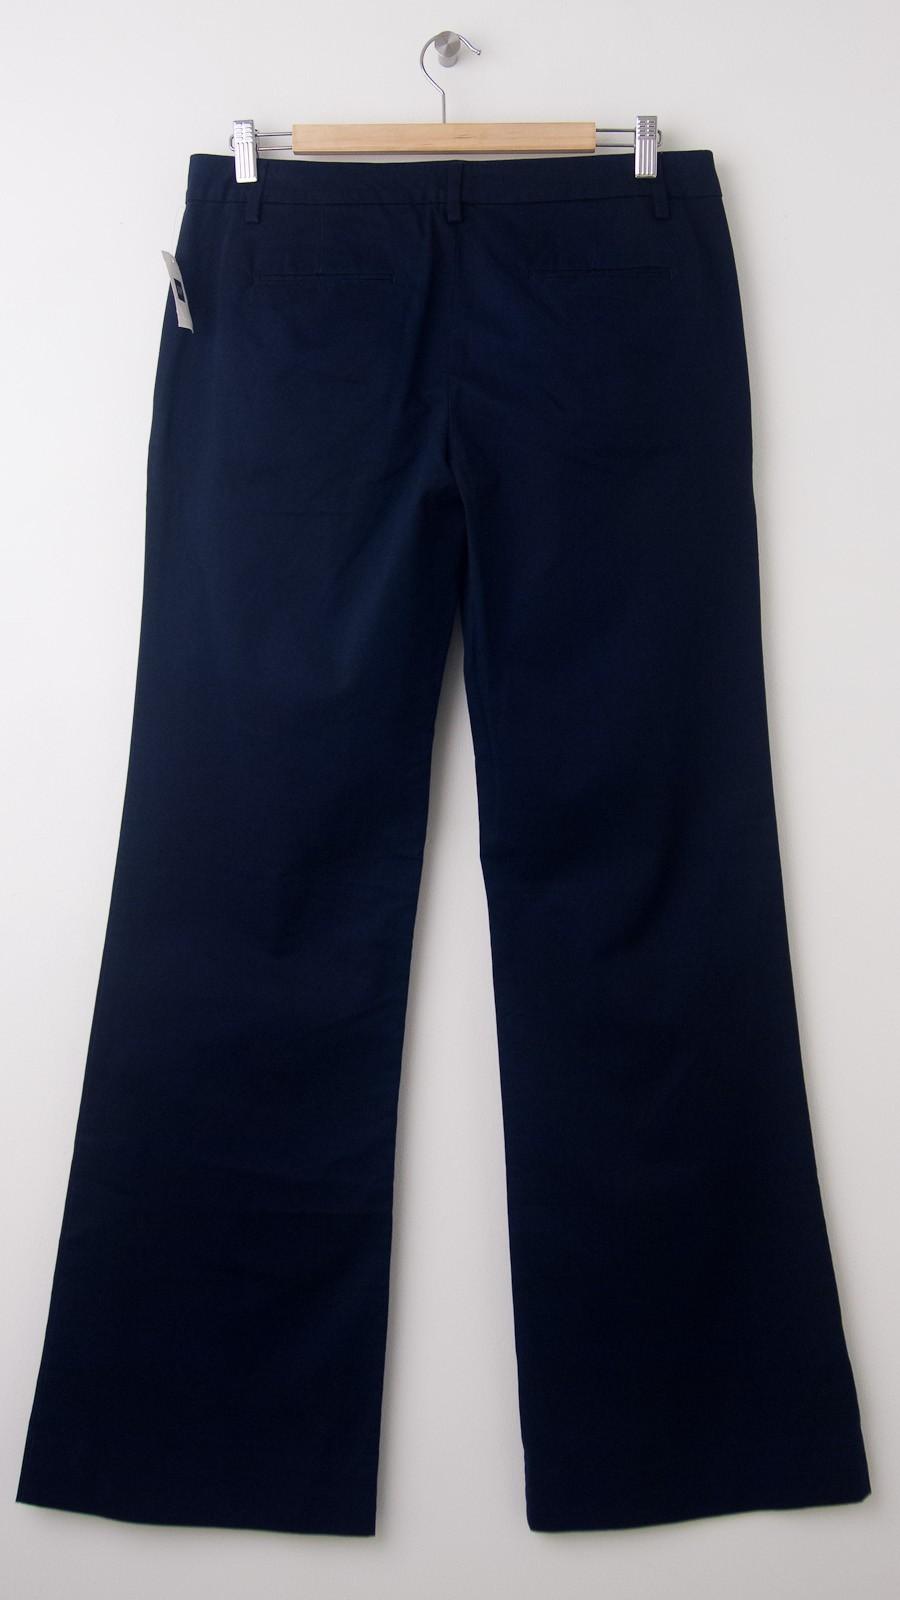 Unique BlueKhakiPantsForWomen Gap Perfect Khaki Pants In Blue Blue